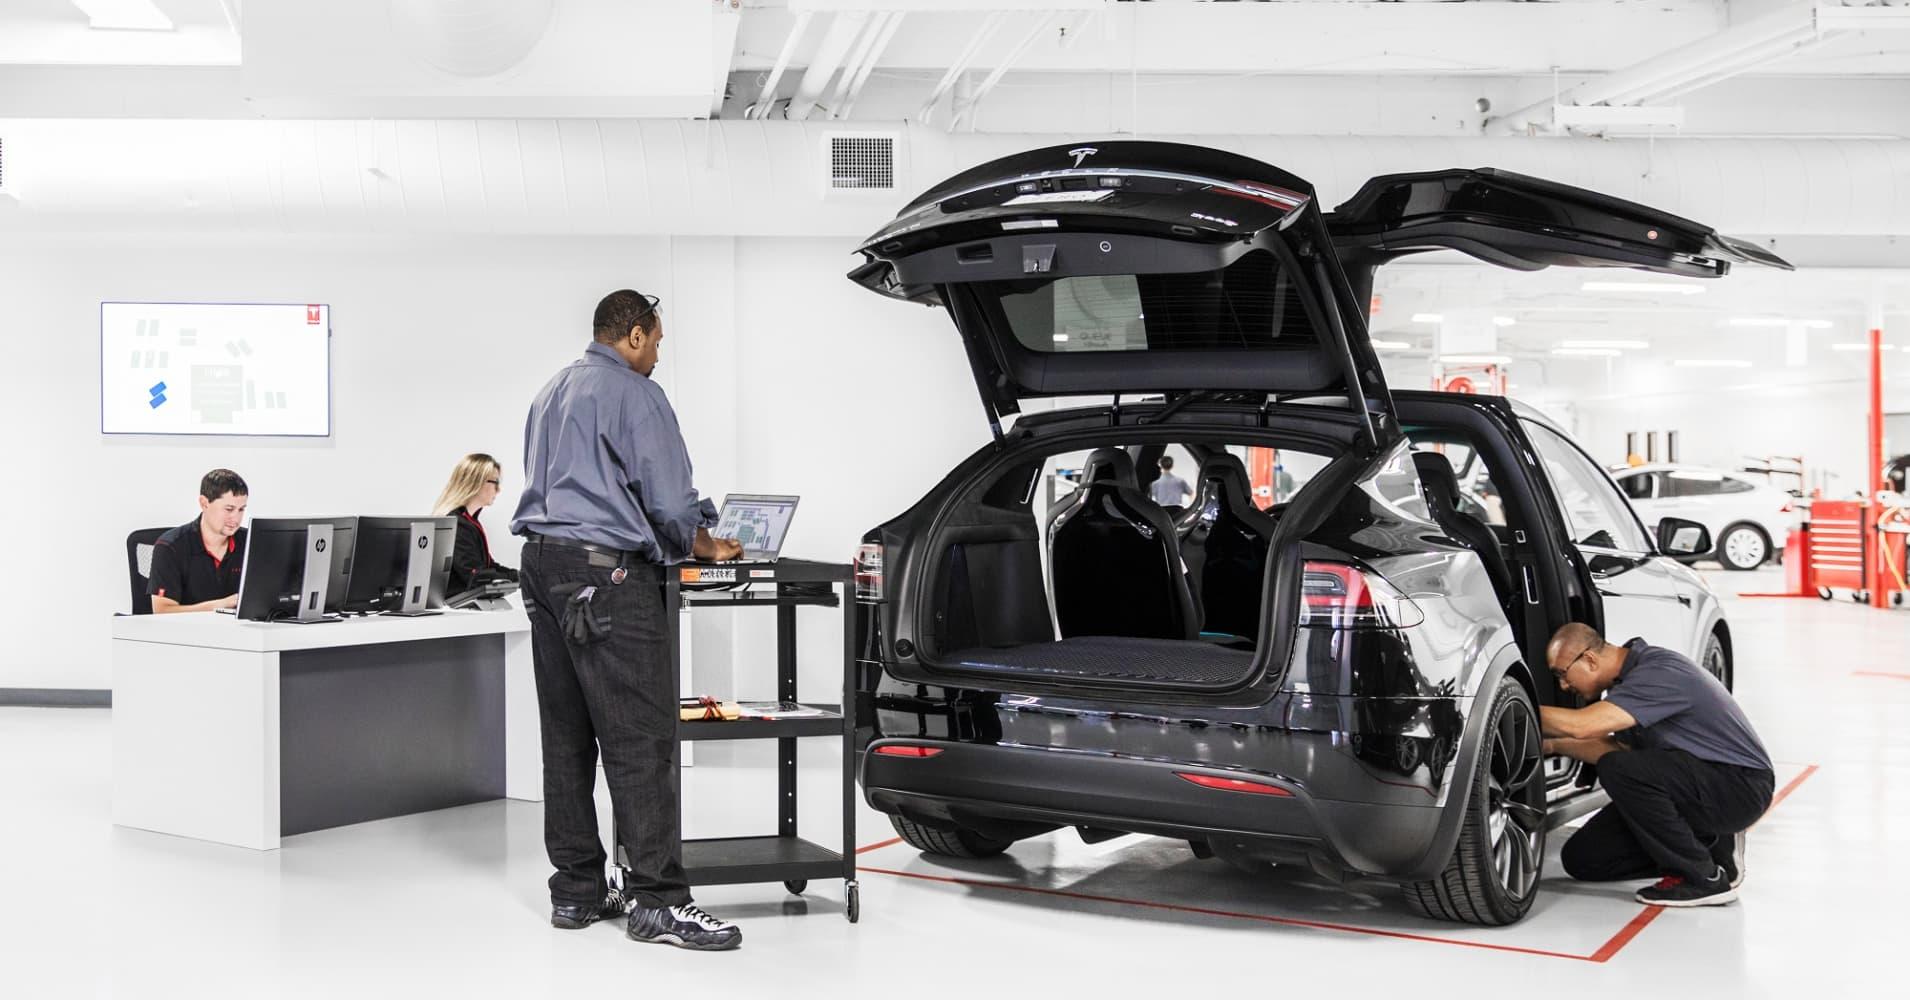 A Tesla service center